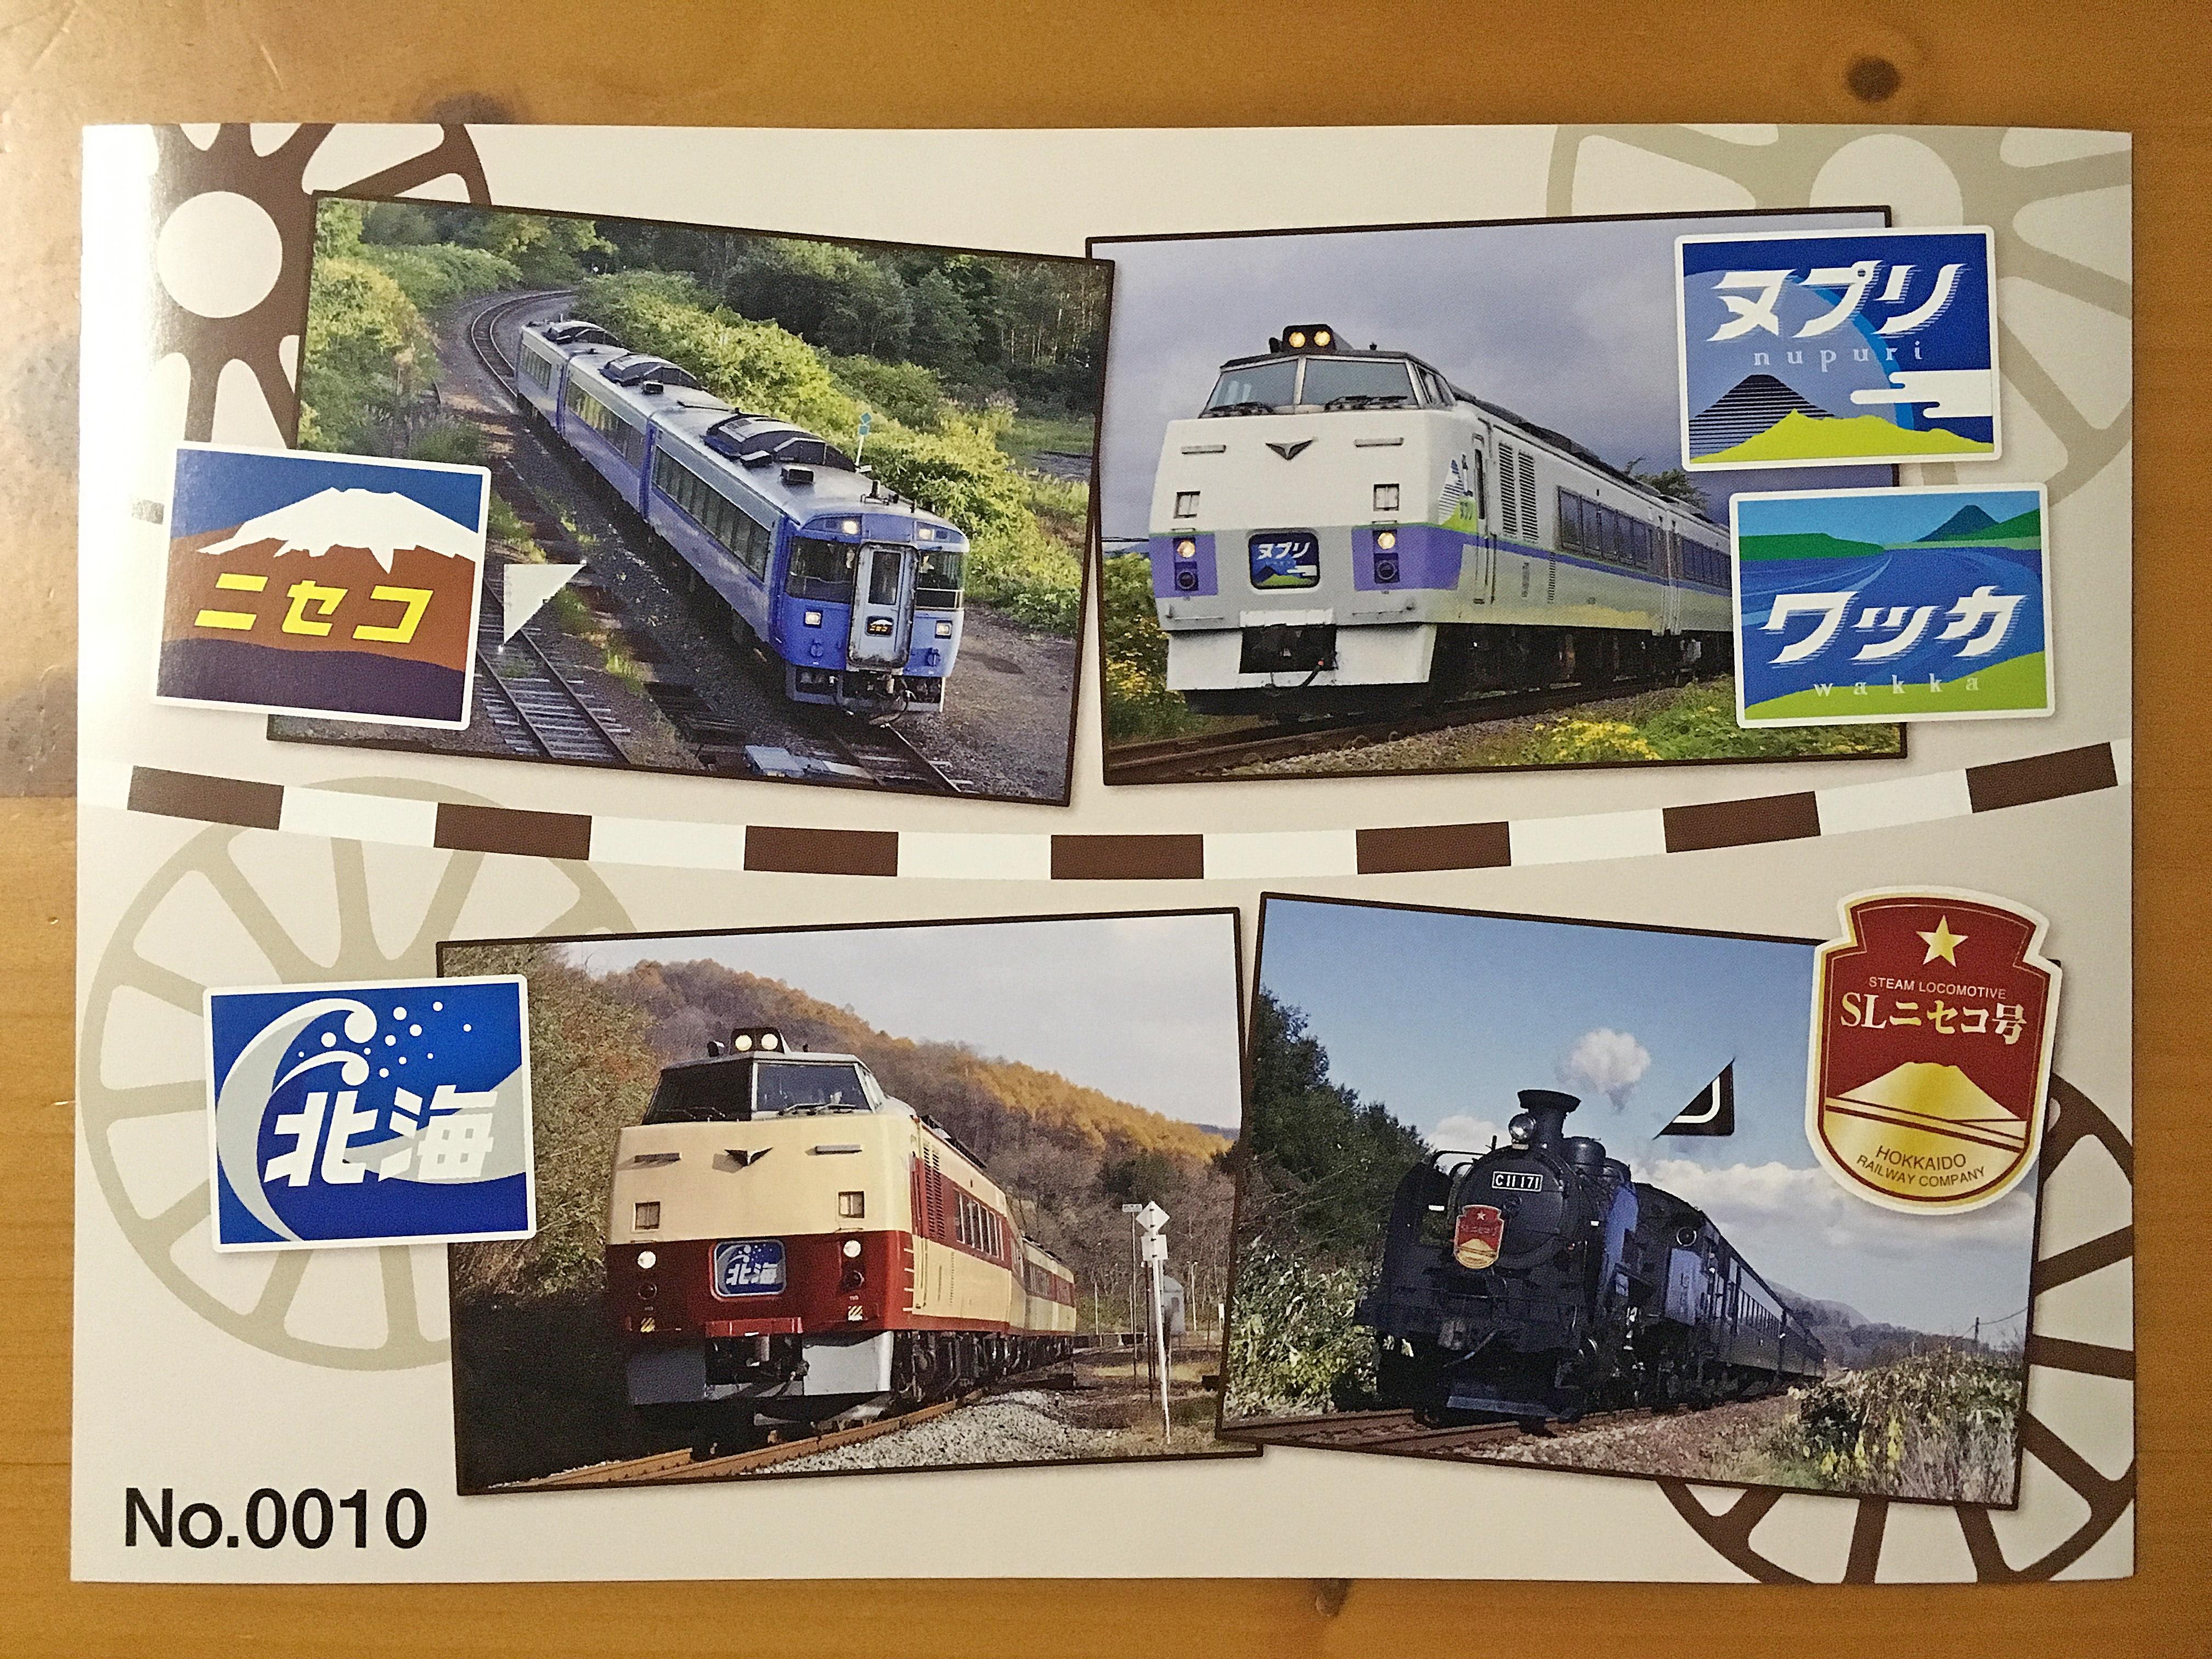 小樽駅感謝祭 列車カード 裏.JPG